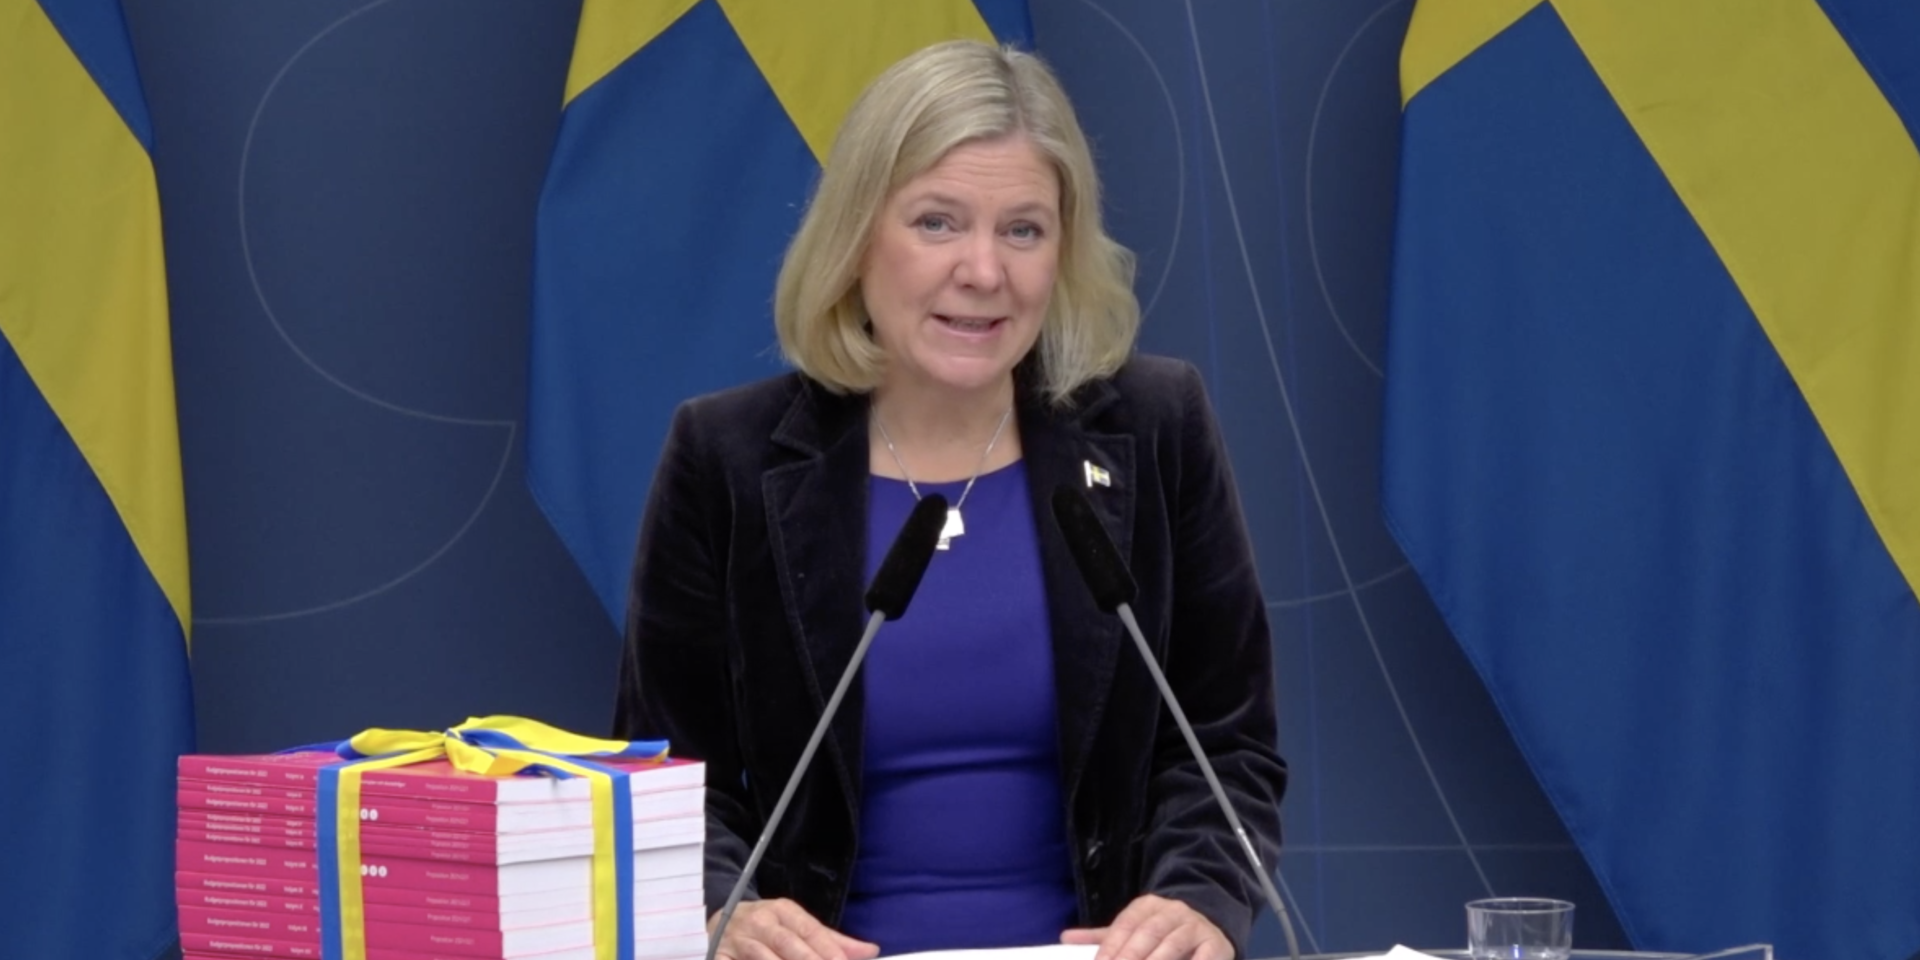 Finansminister Magdalena Andersson presenterar årets budget.